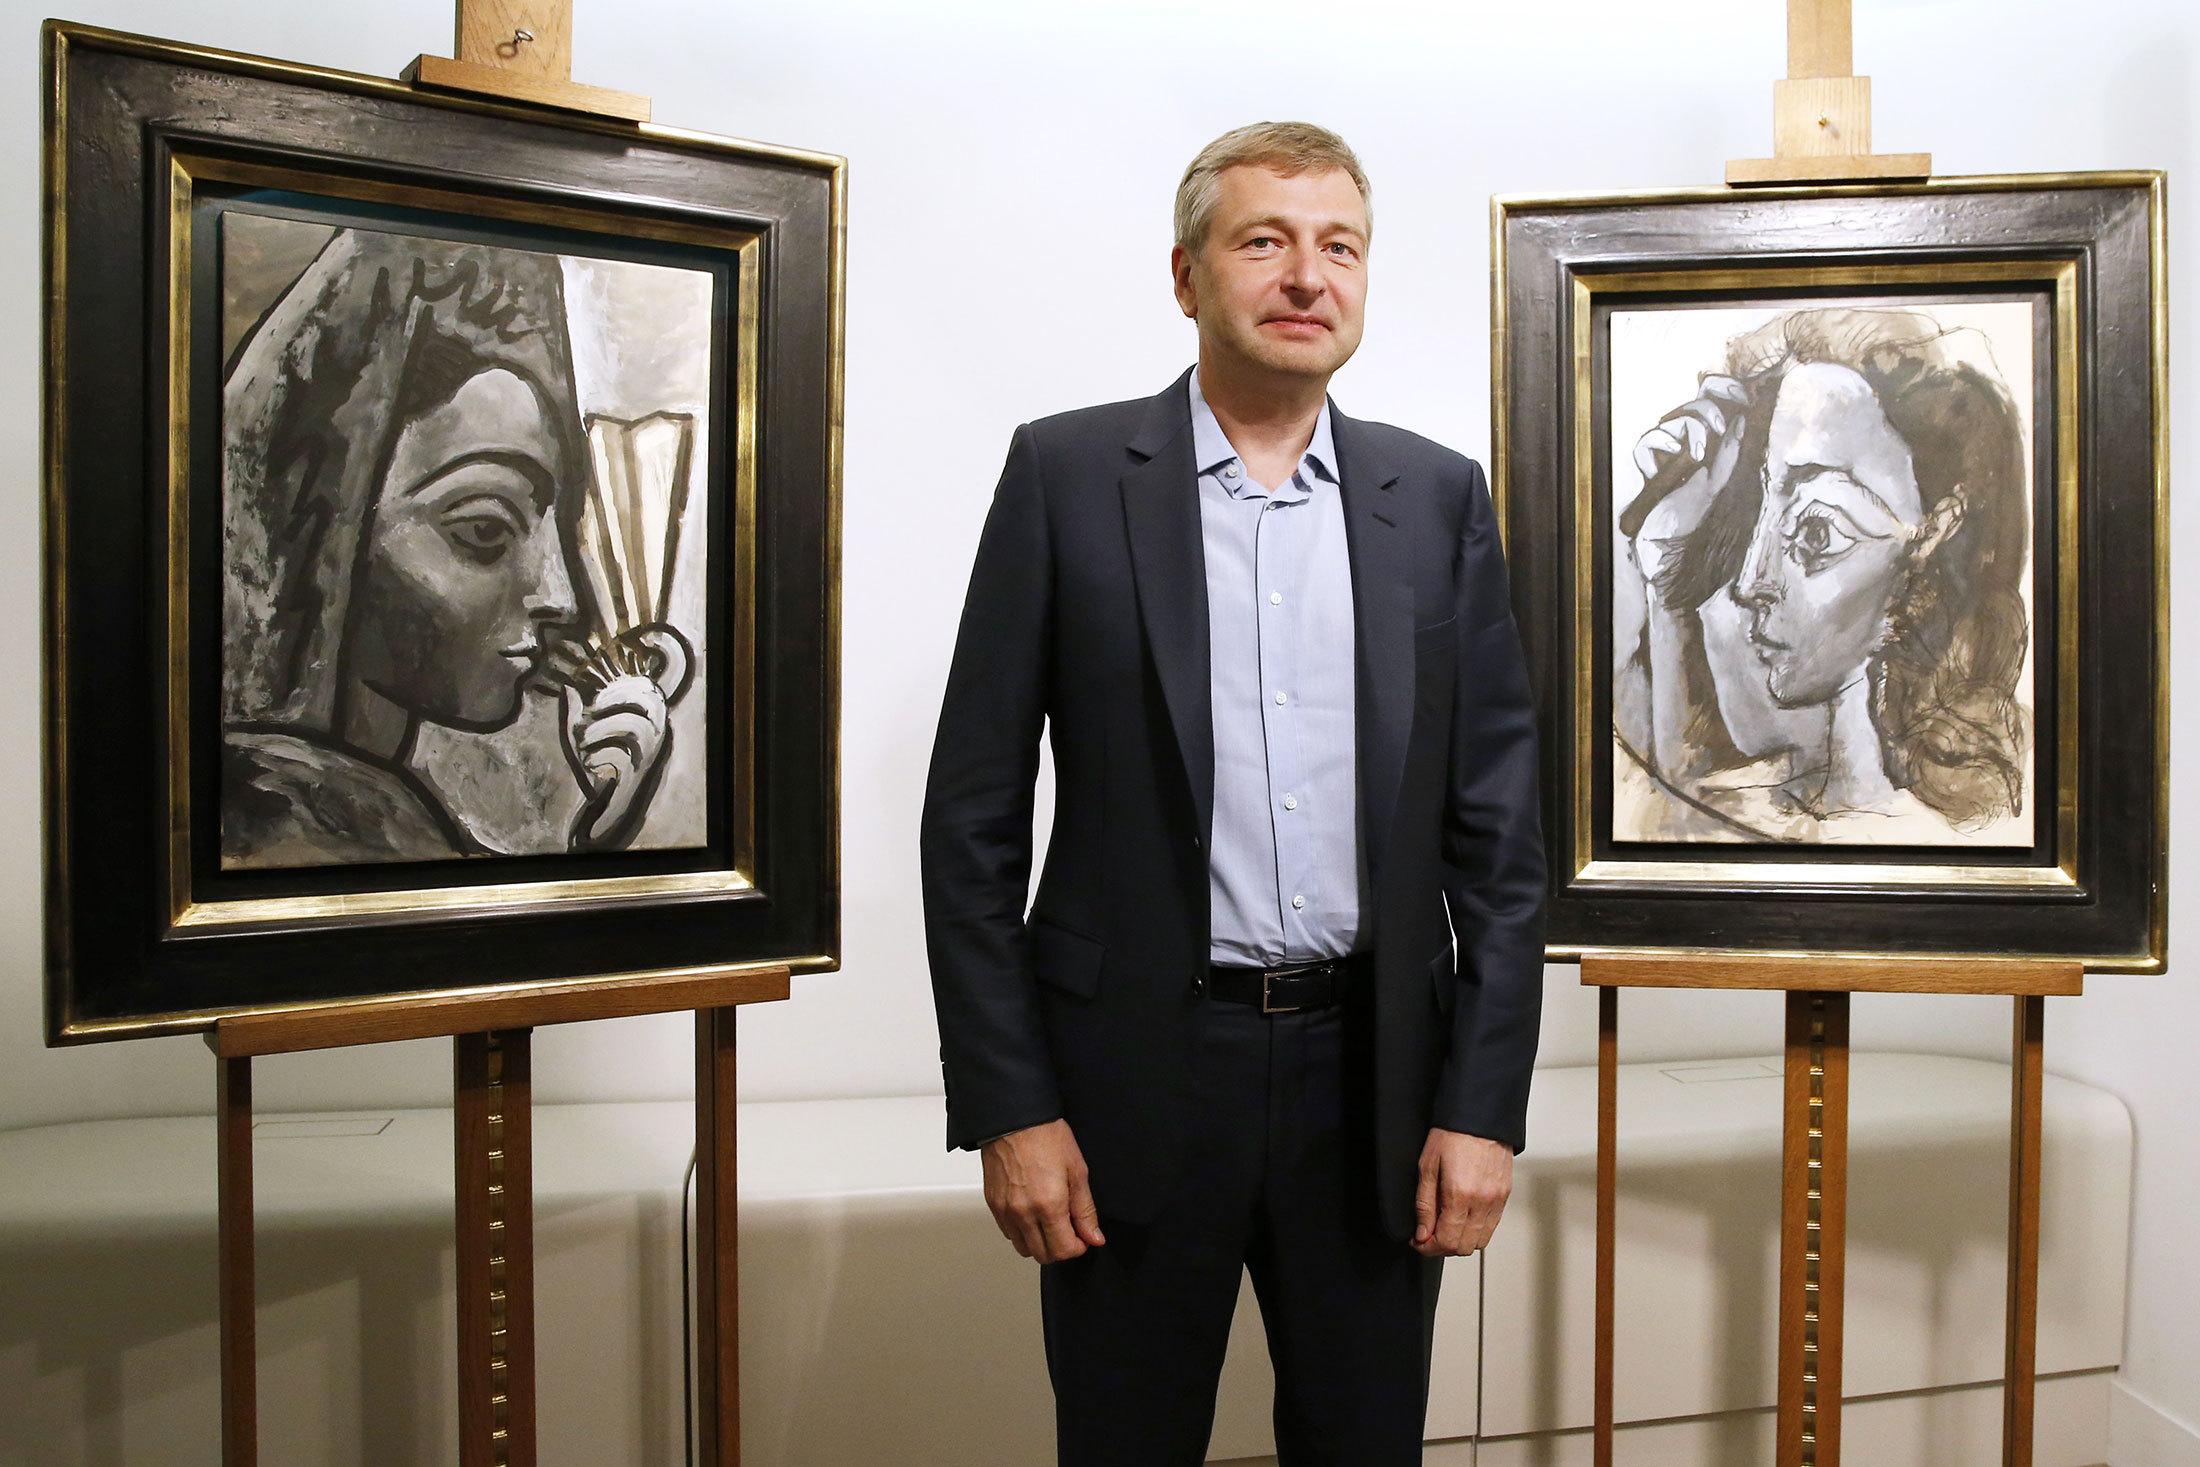 Dmitry Rybolovlev Trump Picasso